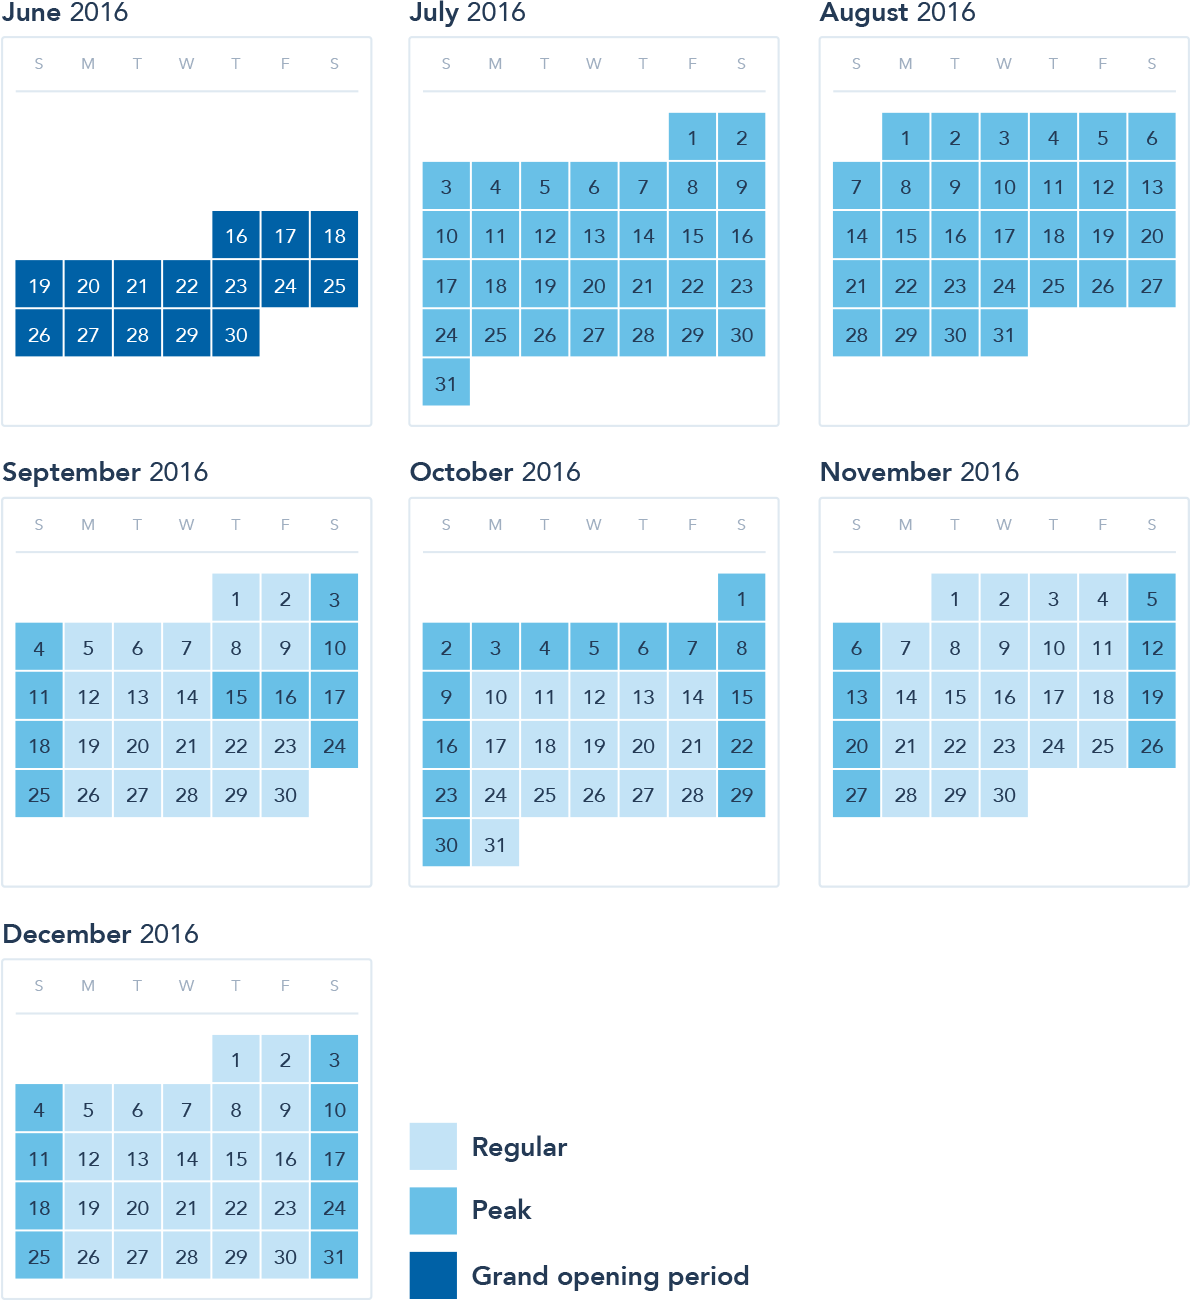 WindowSeat Ticket Pricing Calendar